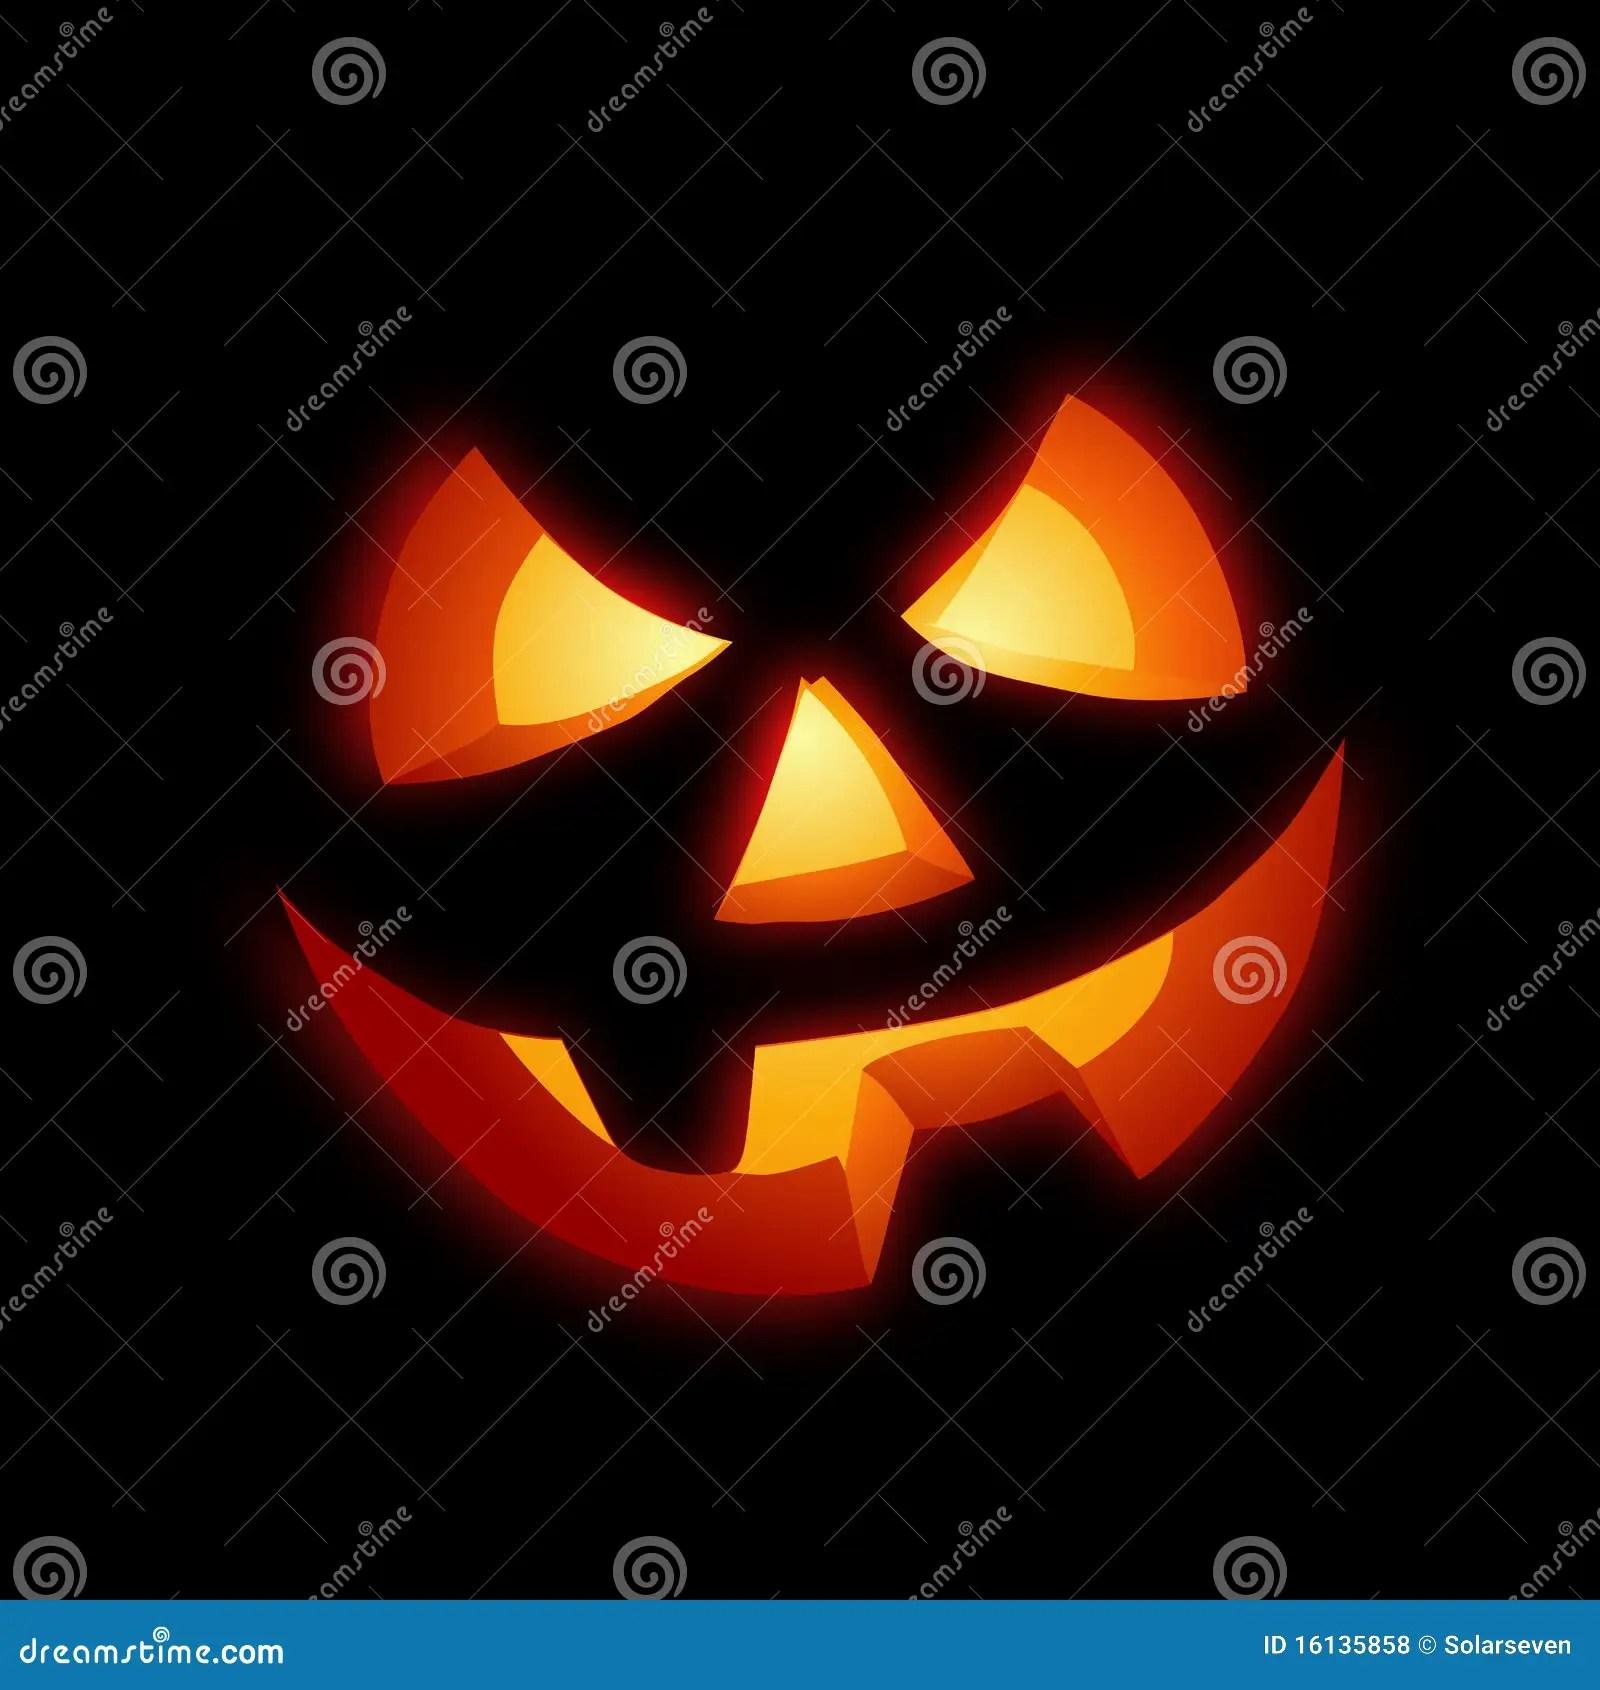 Happy Halloween Pumpkin Royalty Free Stock Photos